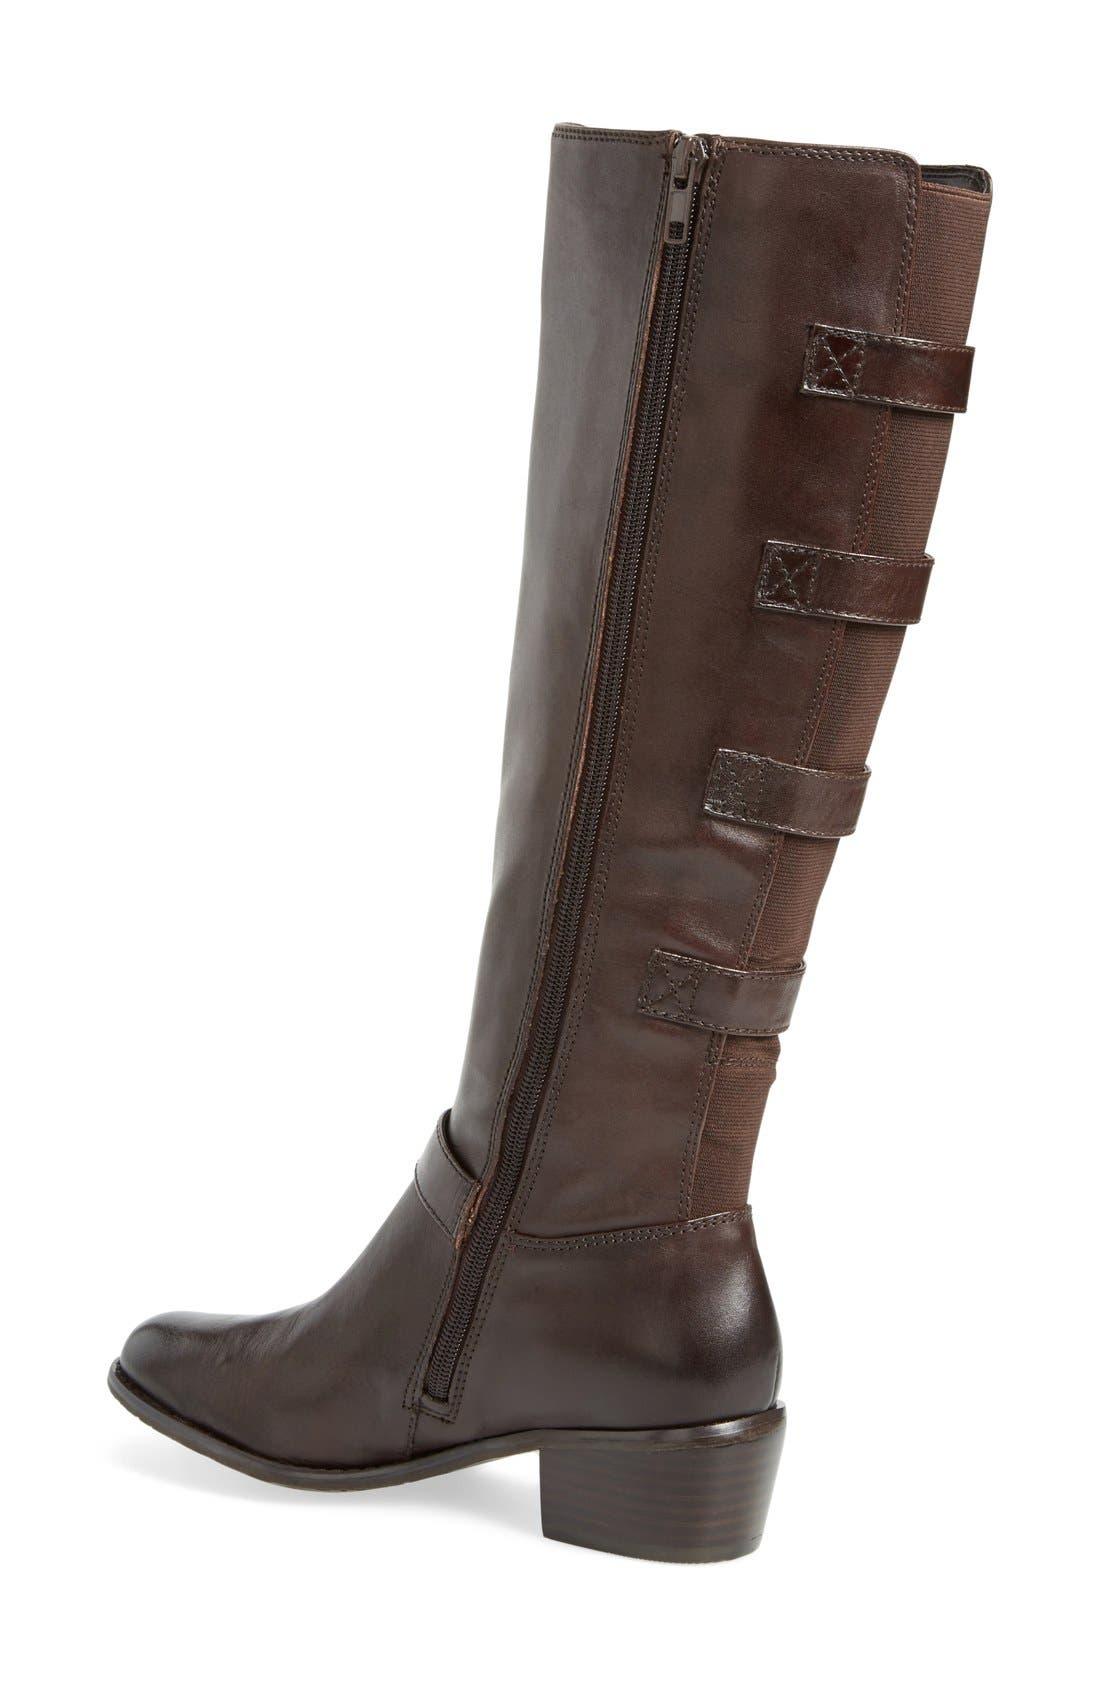 Alternate Image 3  - Arturo Chiang'Beacon' Tall Buckle Boot (Women)